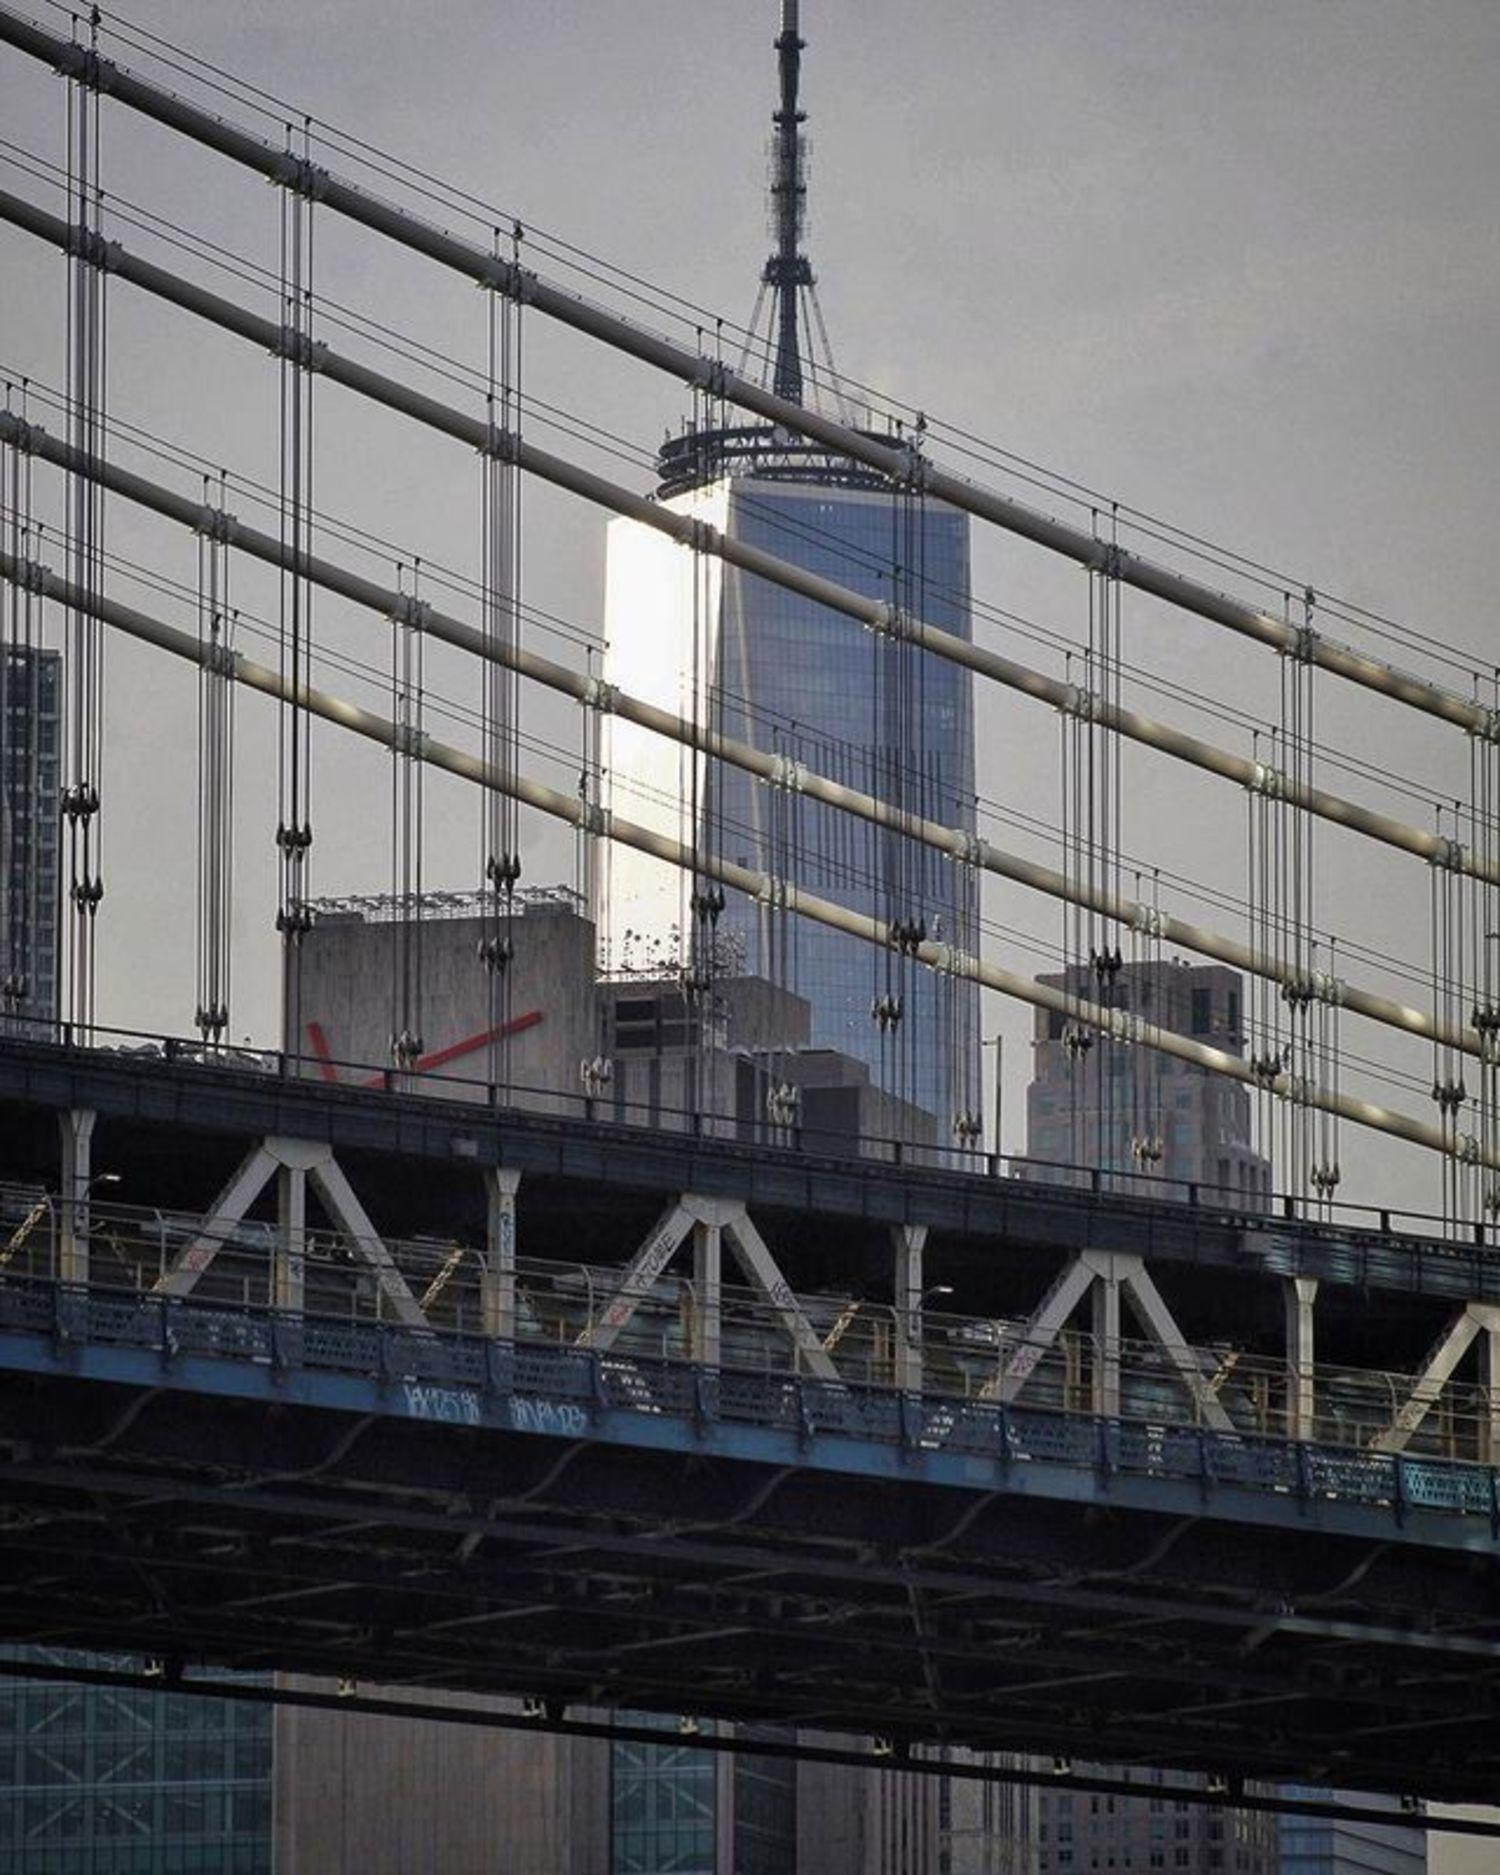 One World Trade Center through the cables of the Manhattan Bridge